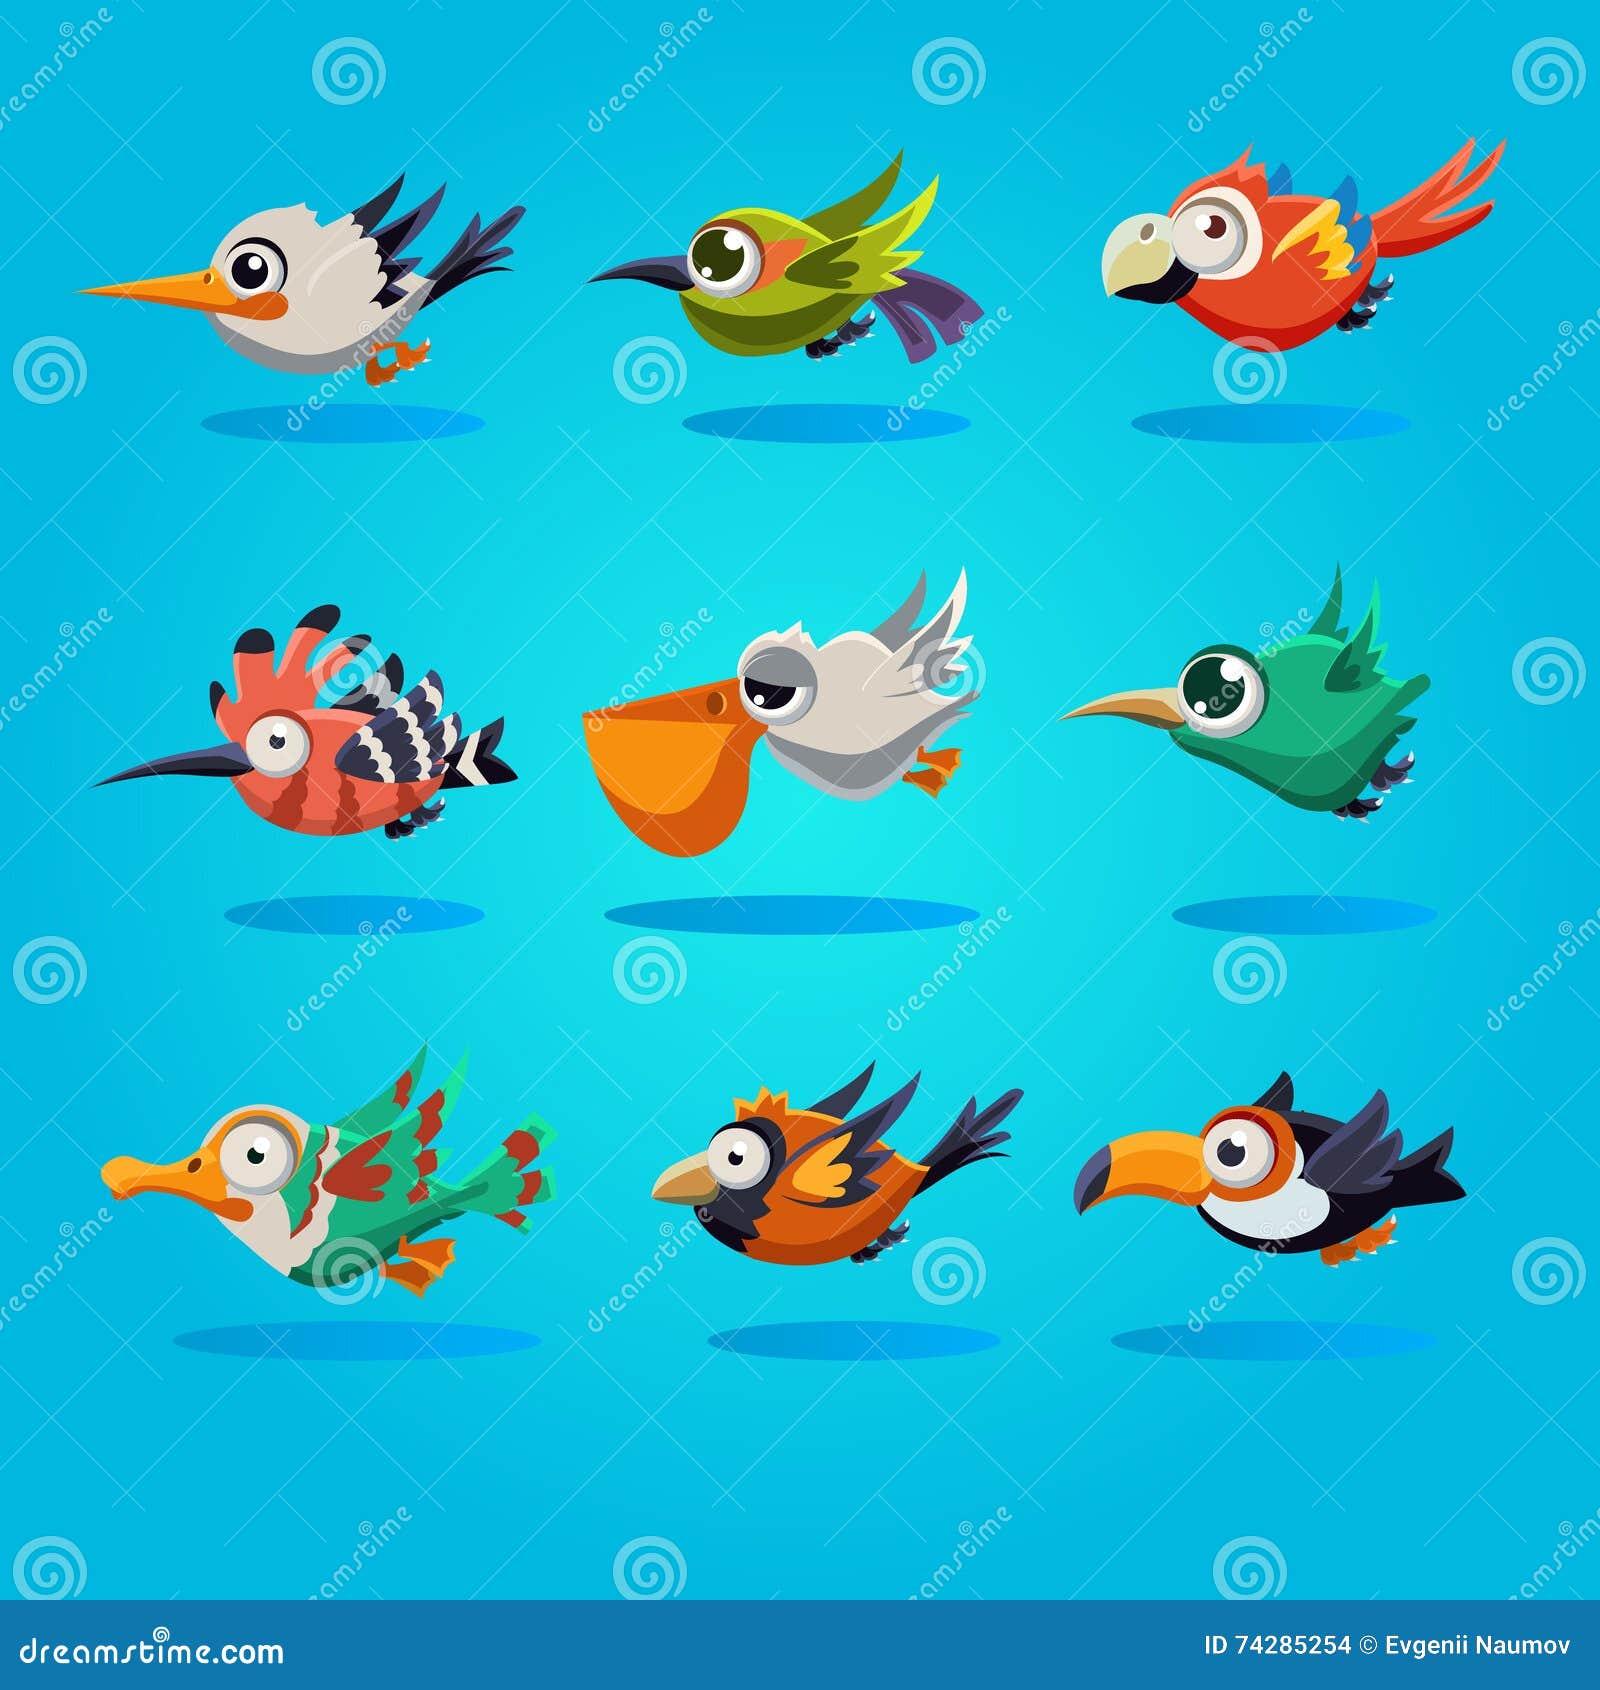 Lustige Karikatur Vogel Illustration Stock Abbildung Illustration